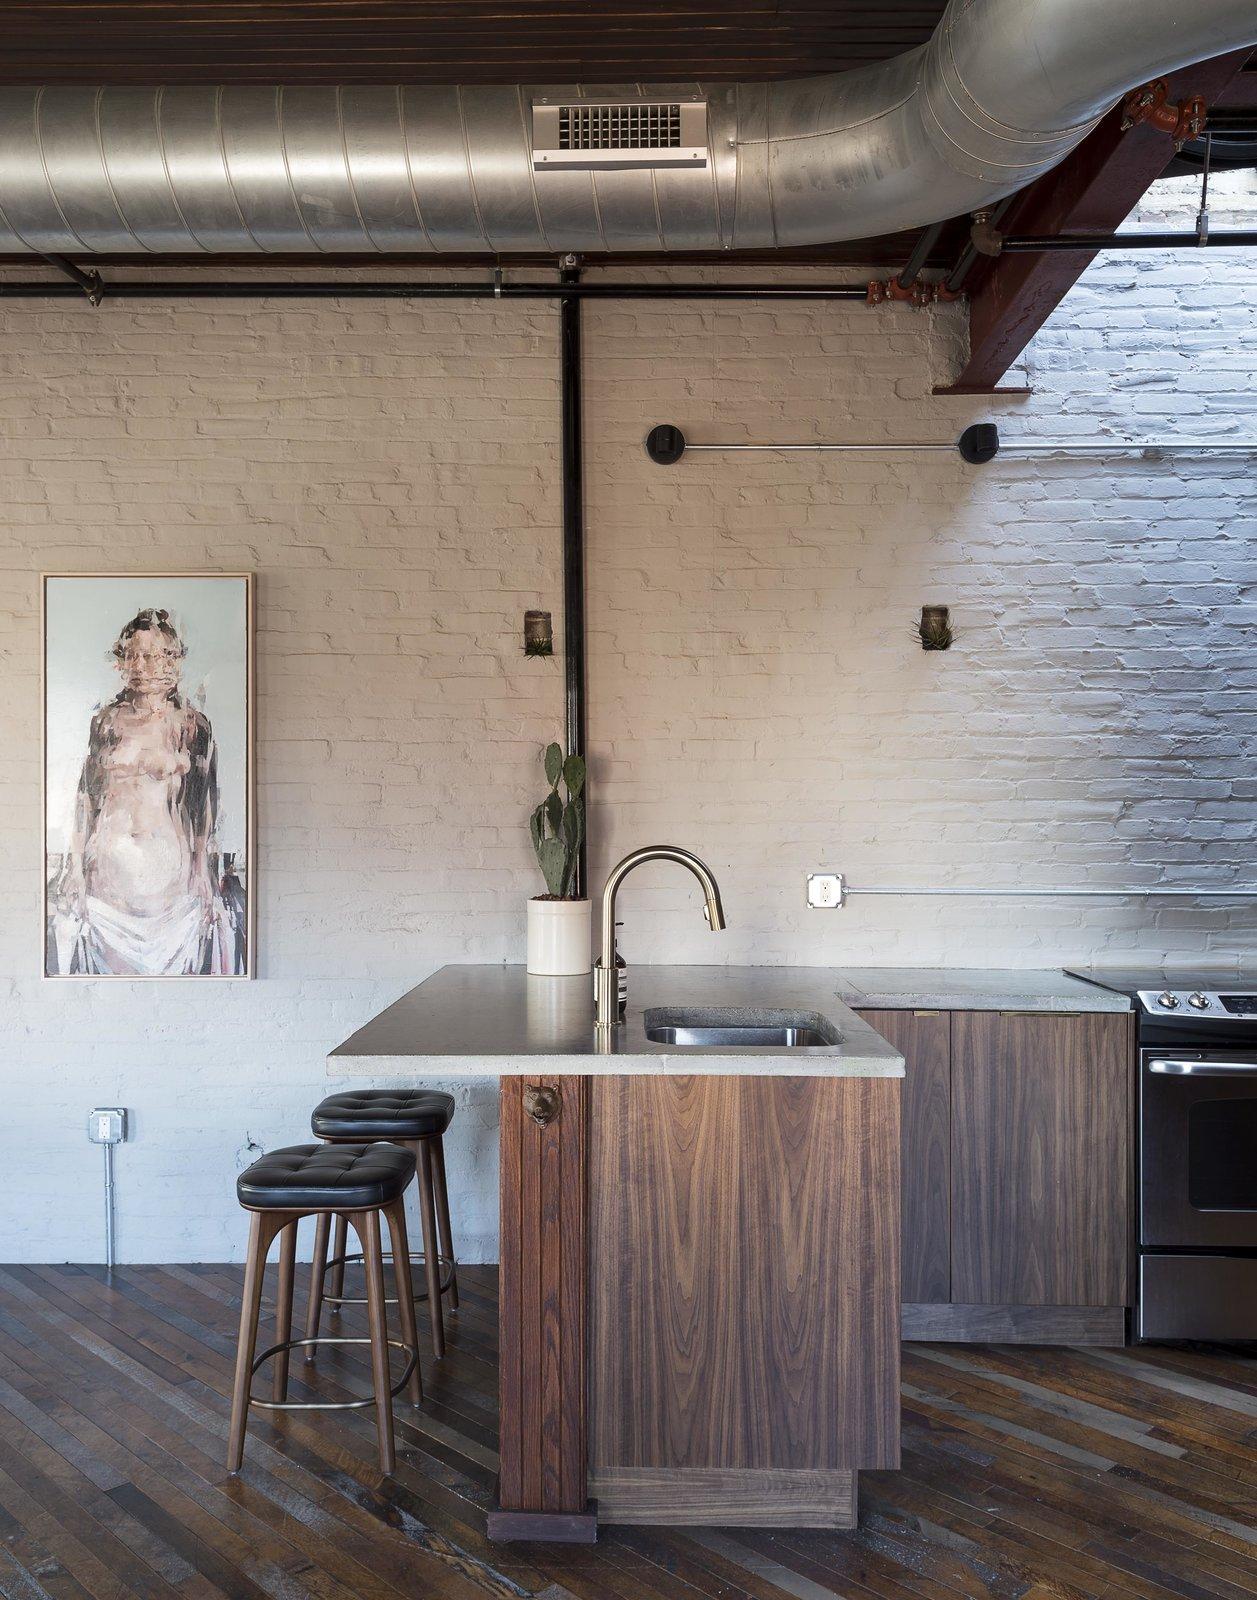 Tagged: Kitchen, Granite Counter, Medium Hardwood Floor, Wood Cabinet, Brick Backsplashe, Ceiling Lighting, and Track Lighting.  Mulherin's Hotel by Daniel Olsovsky